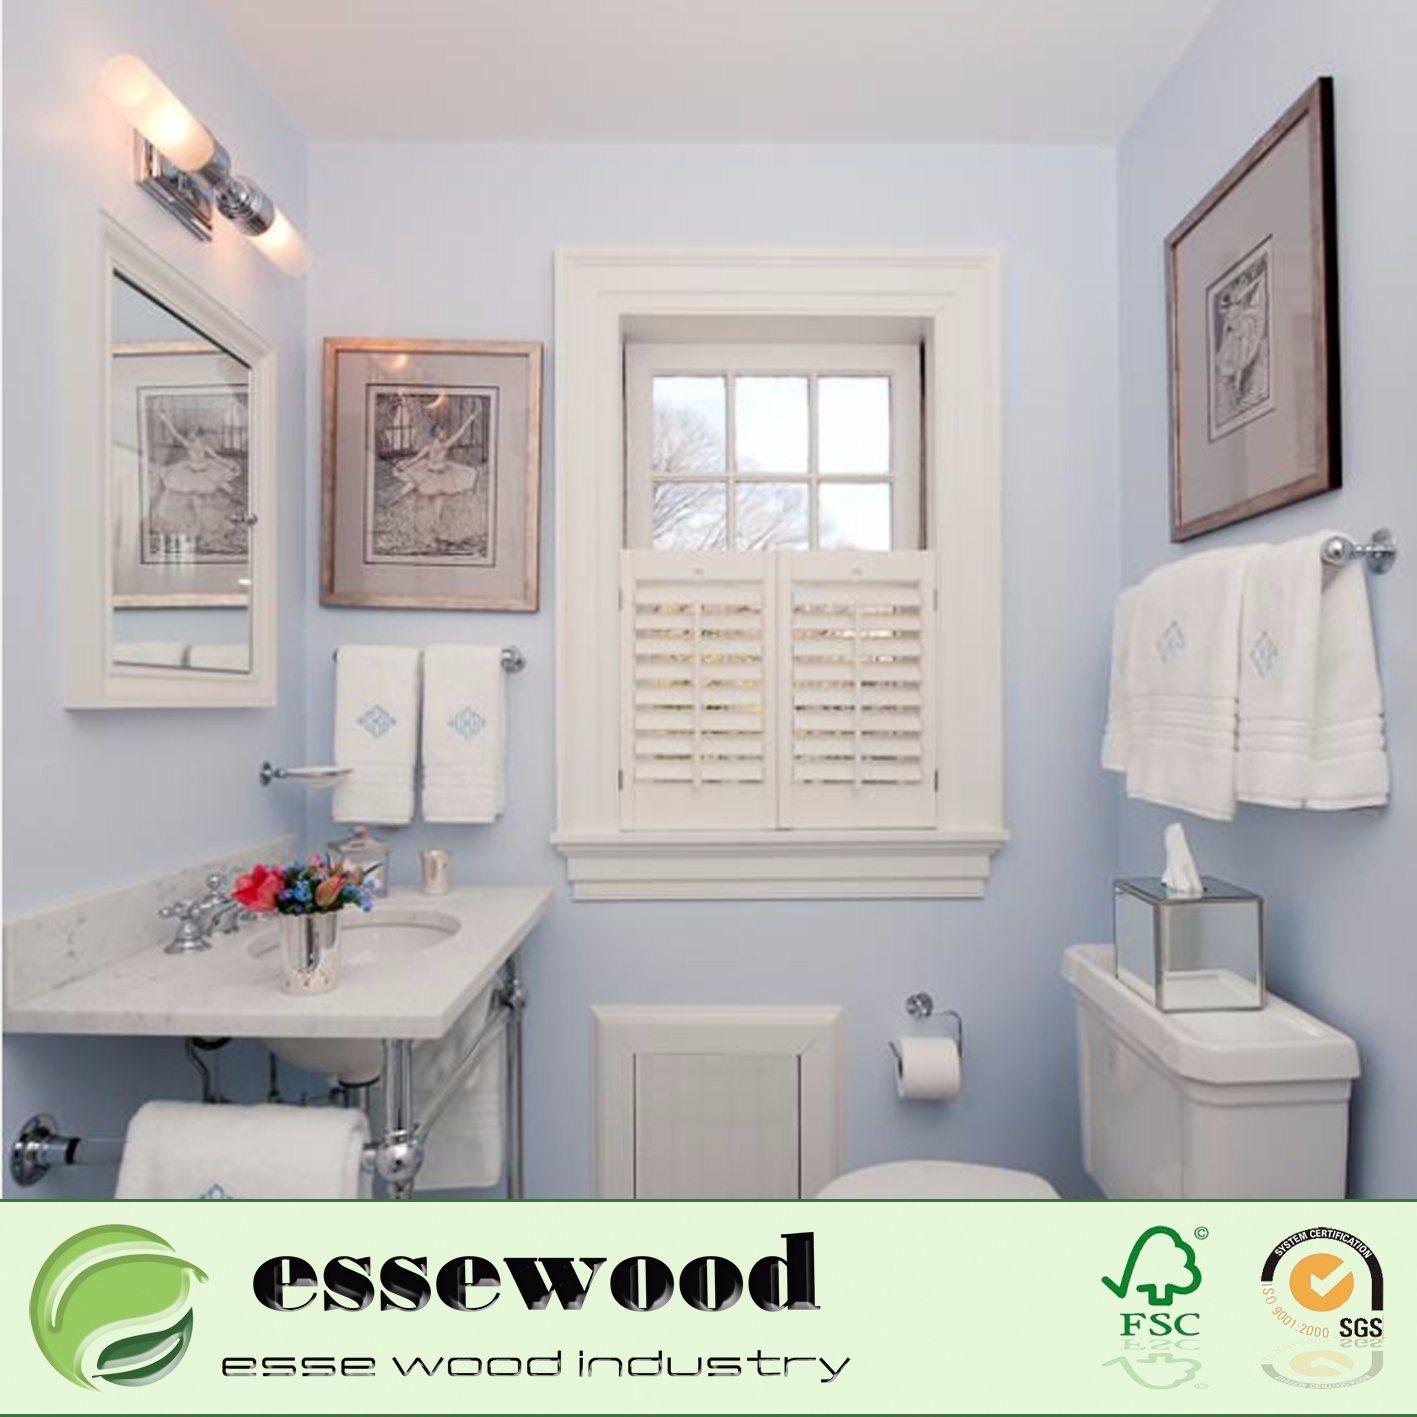 Hot Item Home Decor Bathroom Waterproof Pvc Plantation Shutter Window Decoration